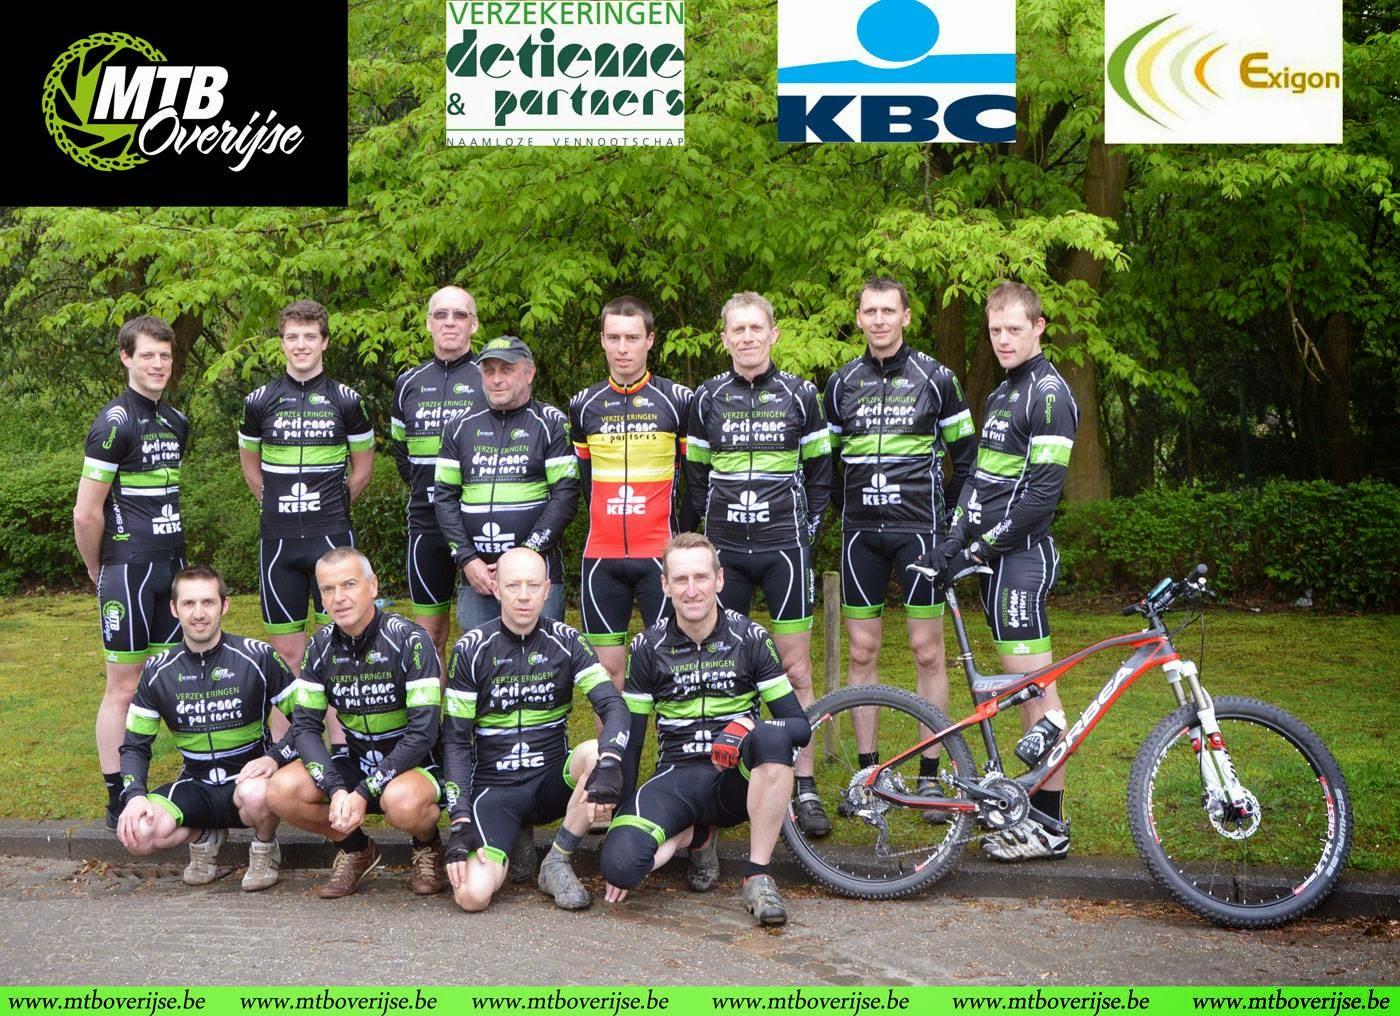 Photo: MTB Overijse 2015